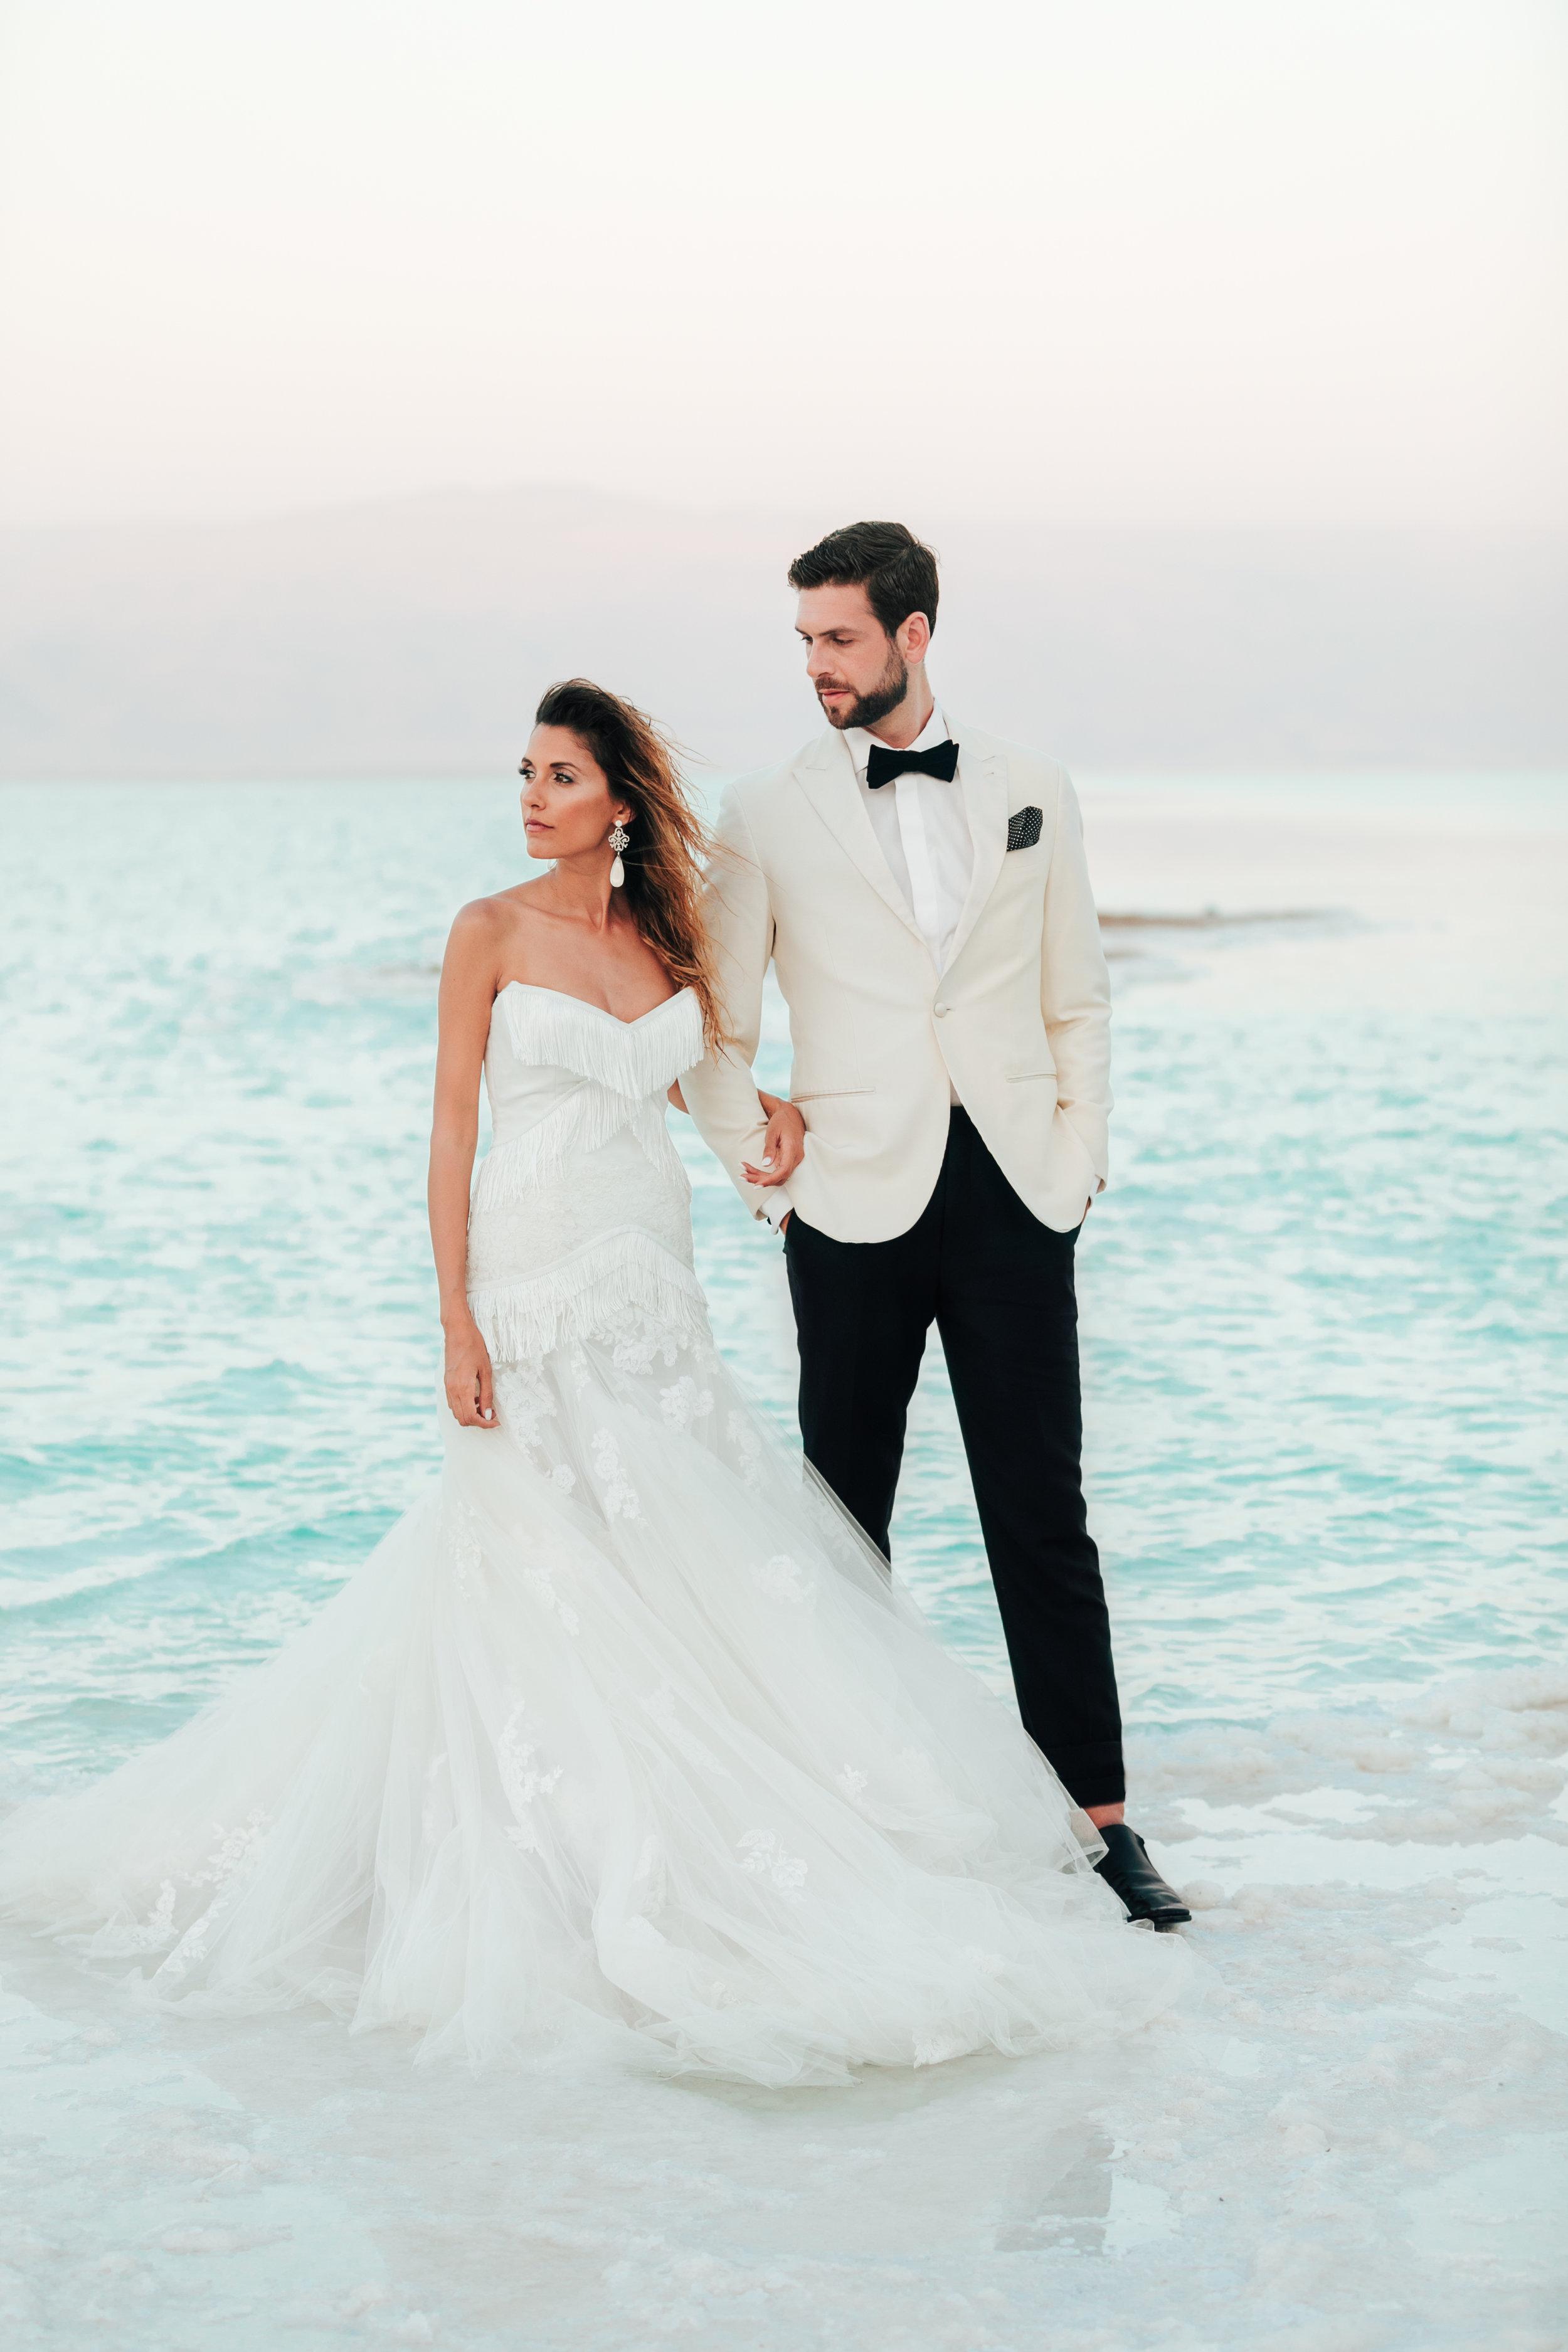 Anée Atelier Israel Nathalie Karynina Bride 13